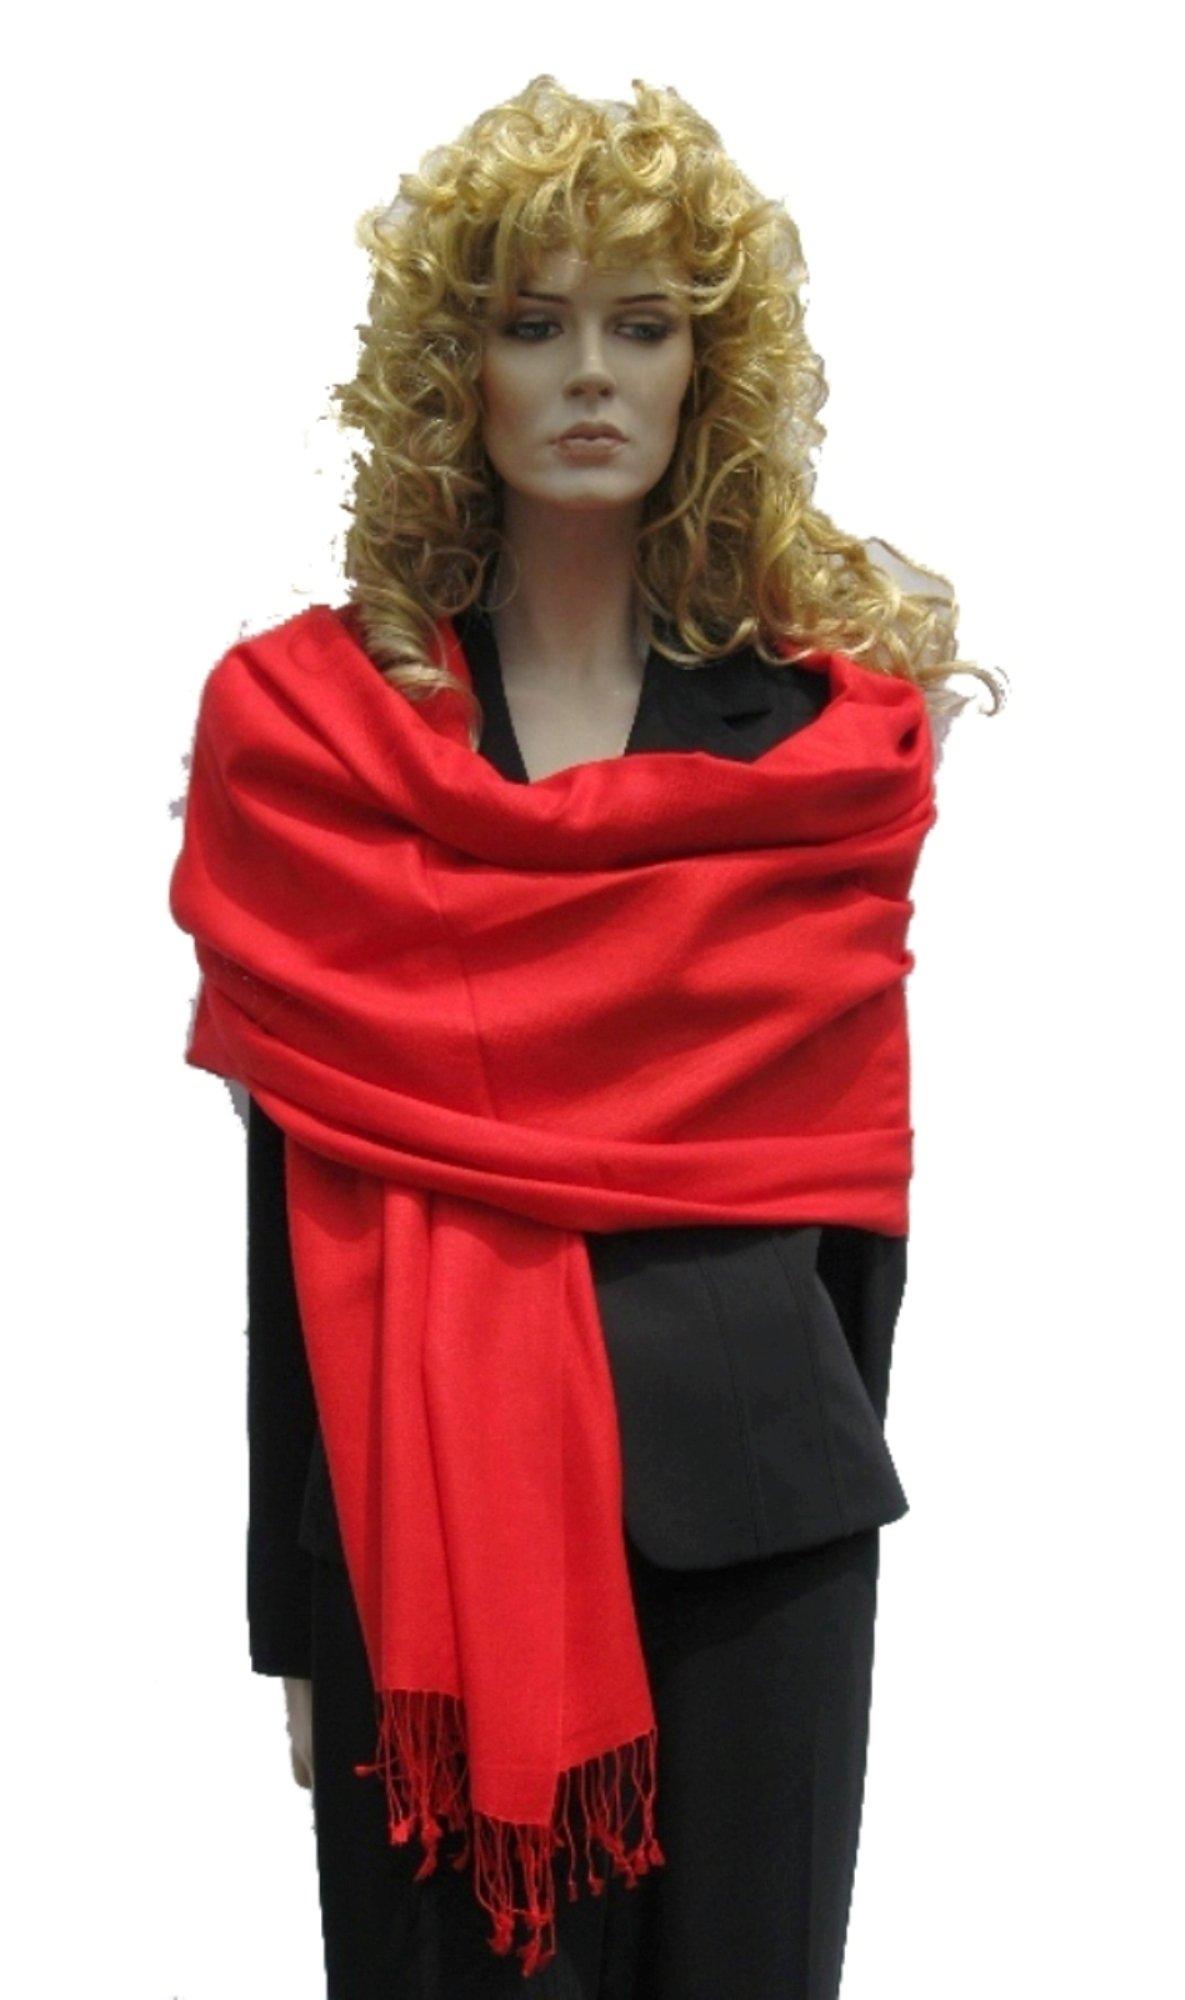 Cashmere Pashmina Group: Solid Pashmina Shawl, Scarf, Wrap & Stole (Large size) Lipstick Red